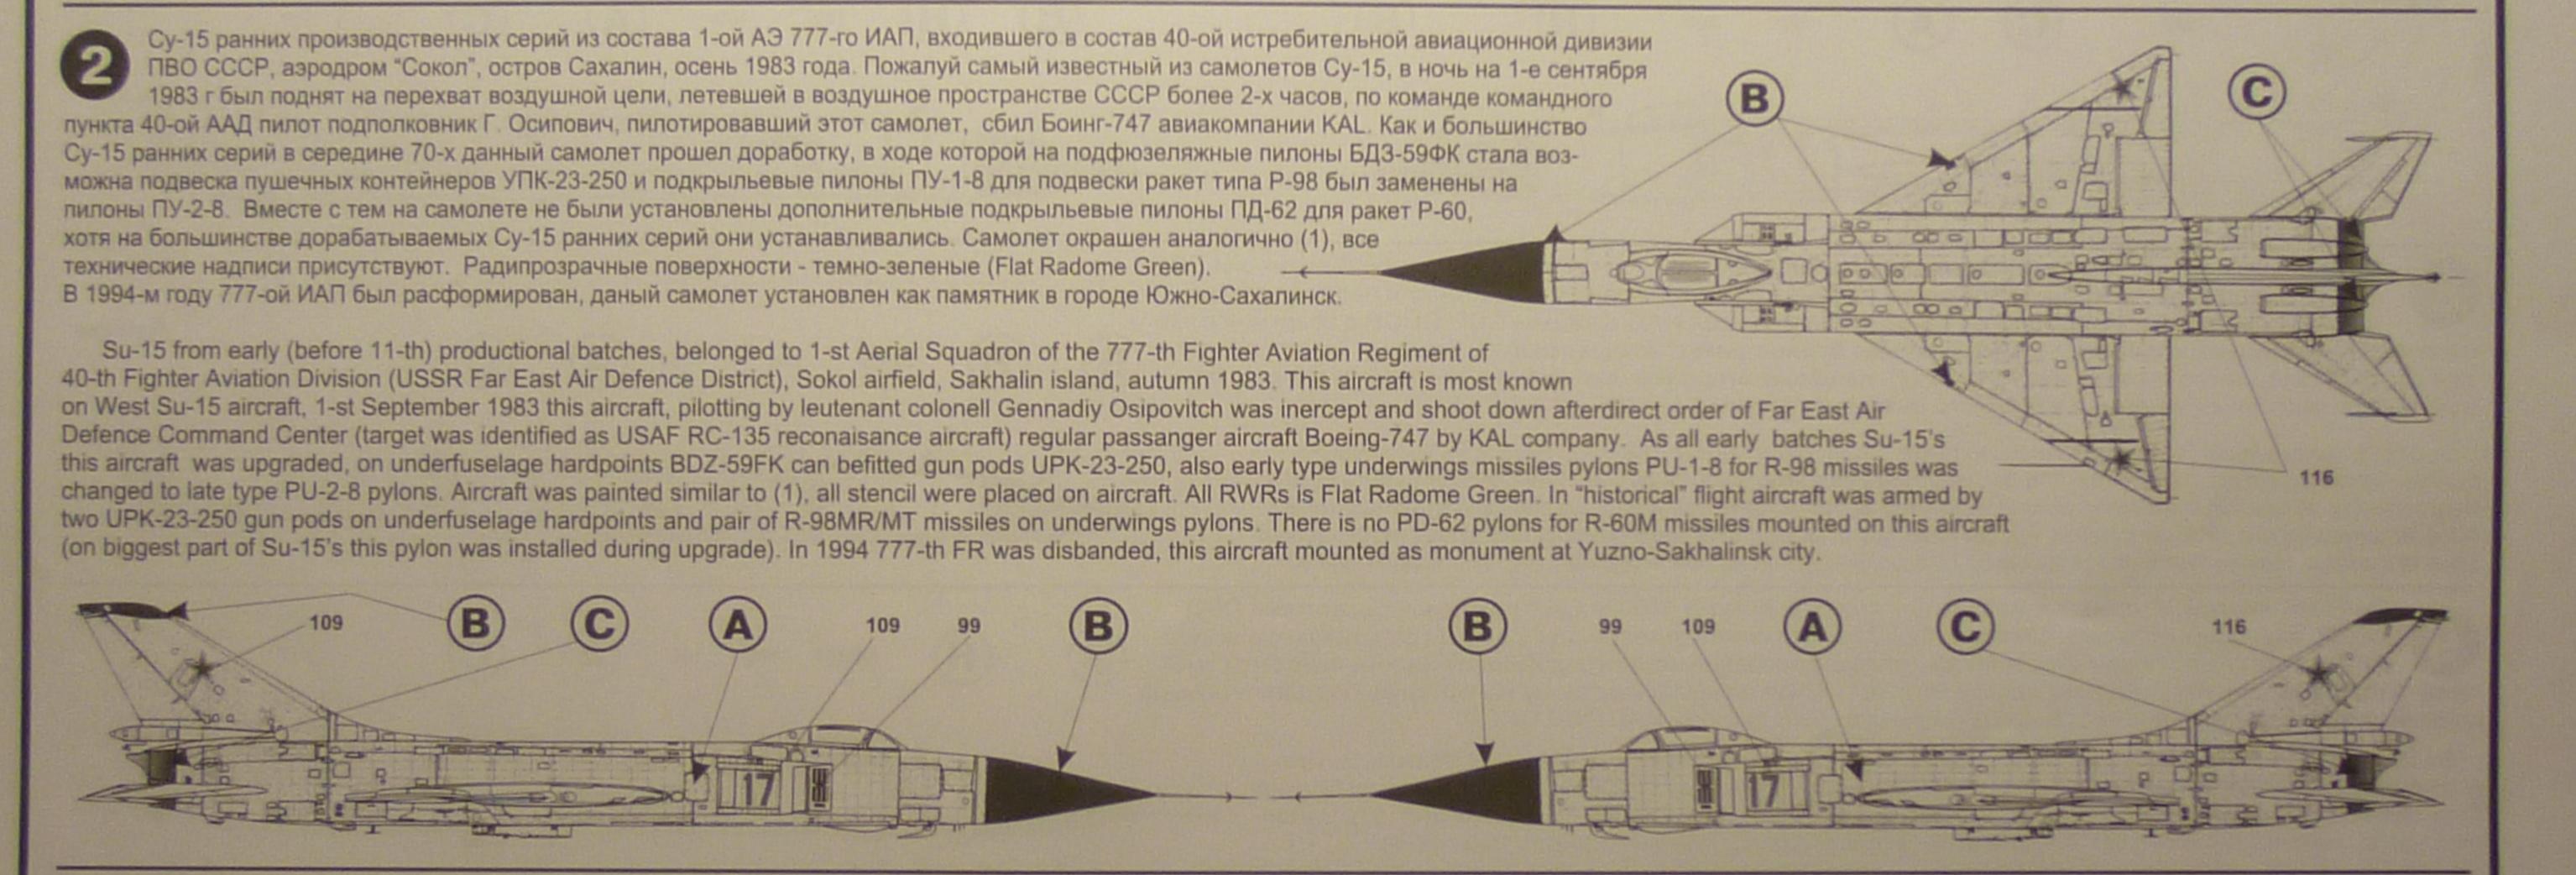 http://sf.uploads.ru/Buaey.jpg